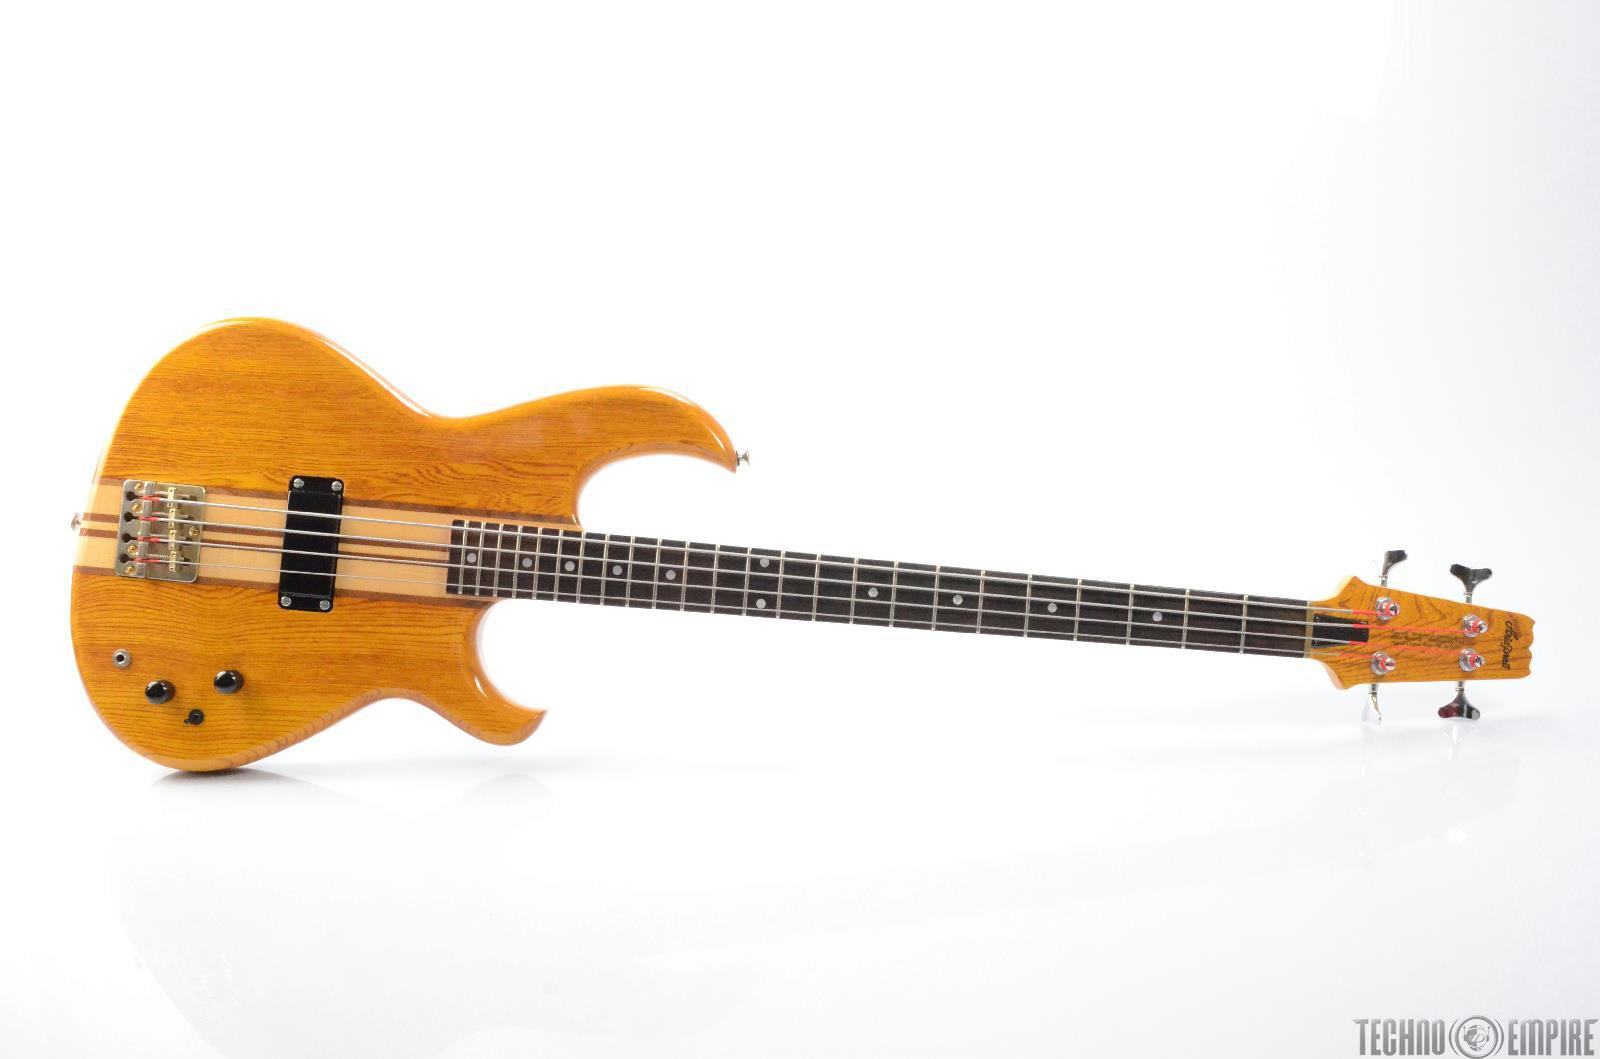 aria pro ii sb 600 electric bass guitar w gig bag 26405 ebay. Black Bedroom Furniture Sets. Home Design Ideas